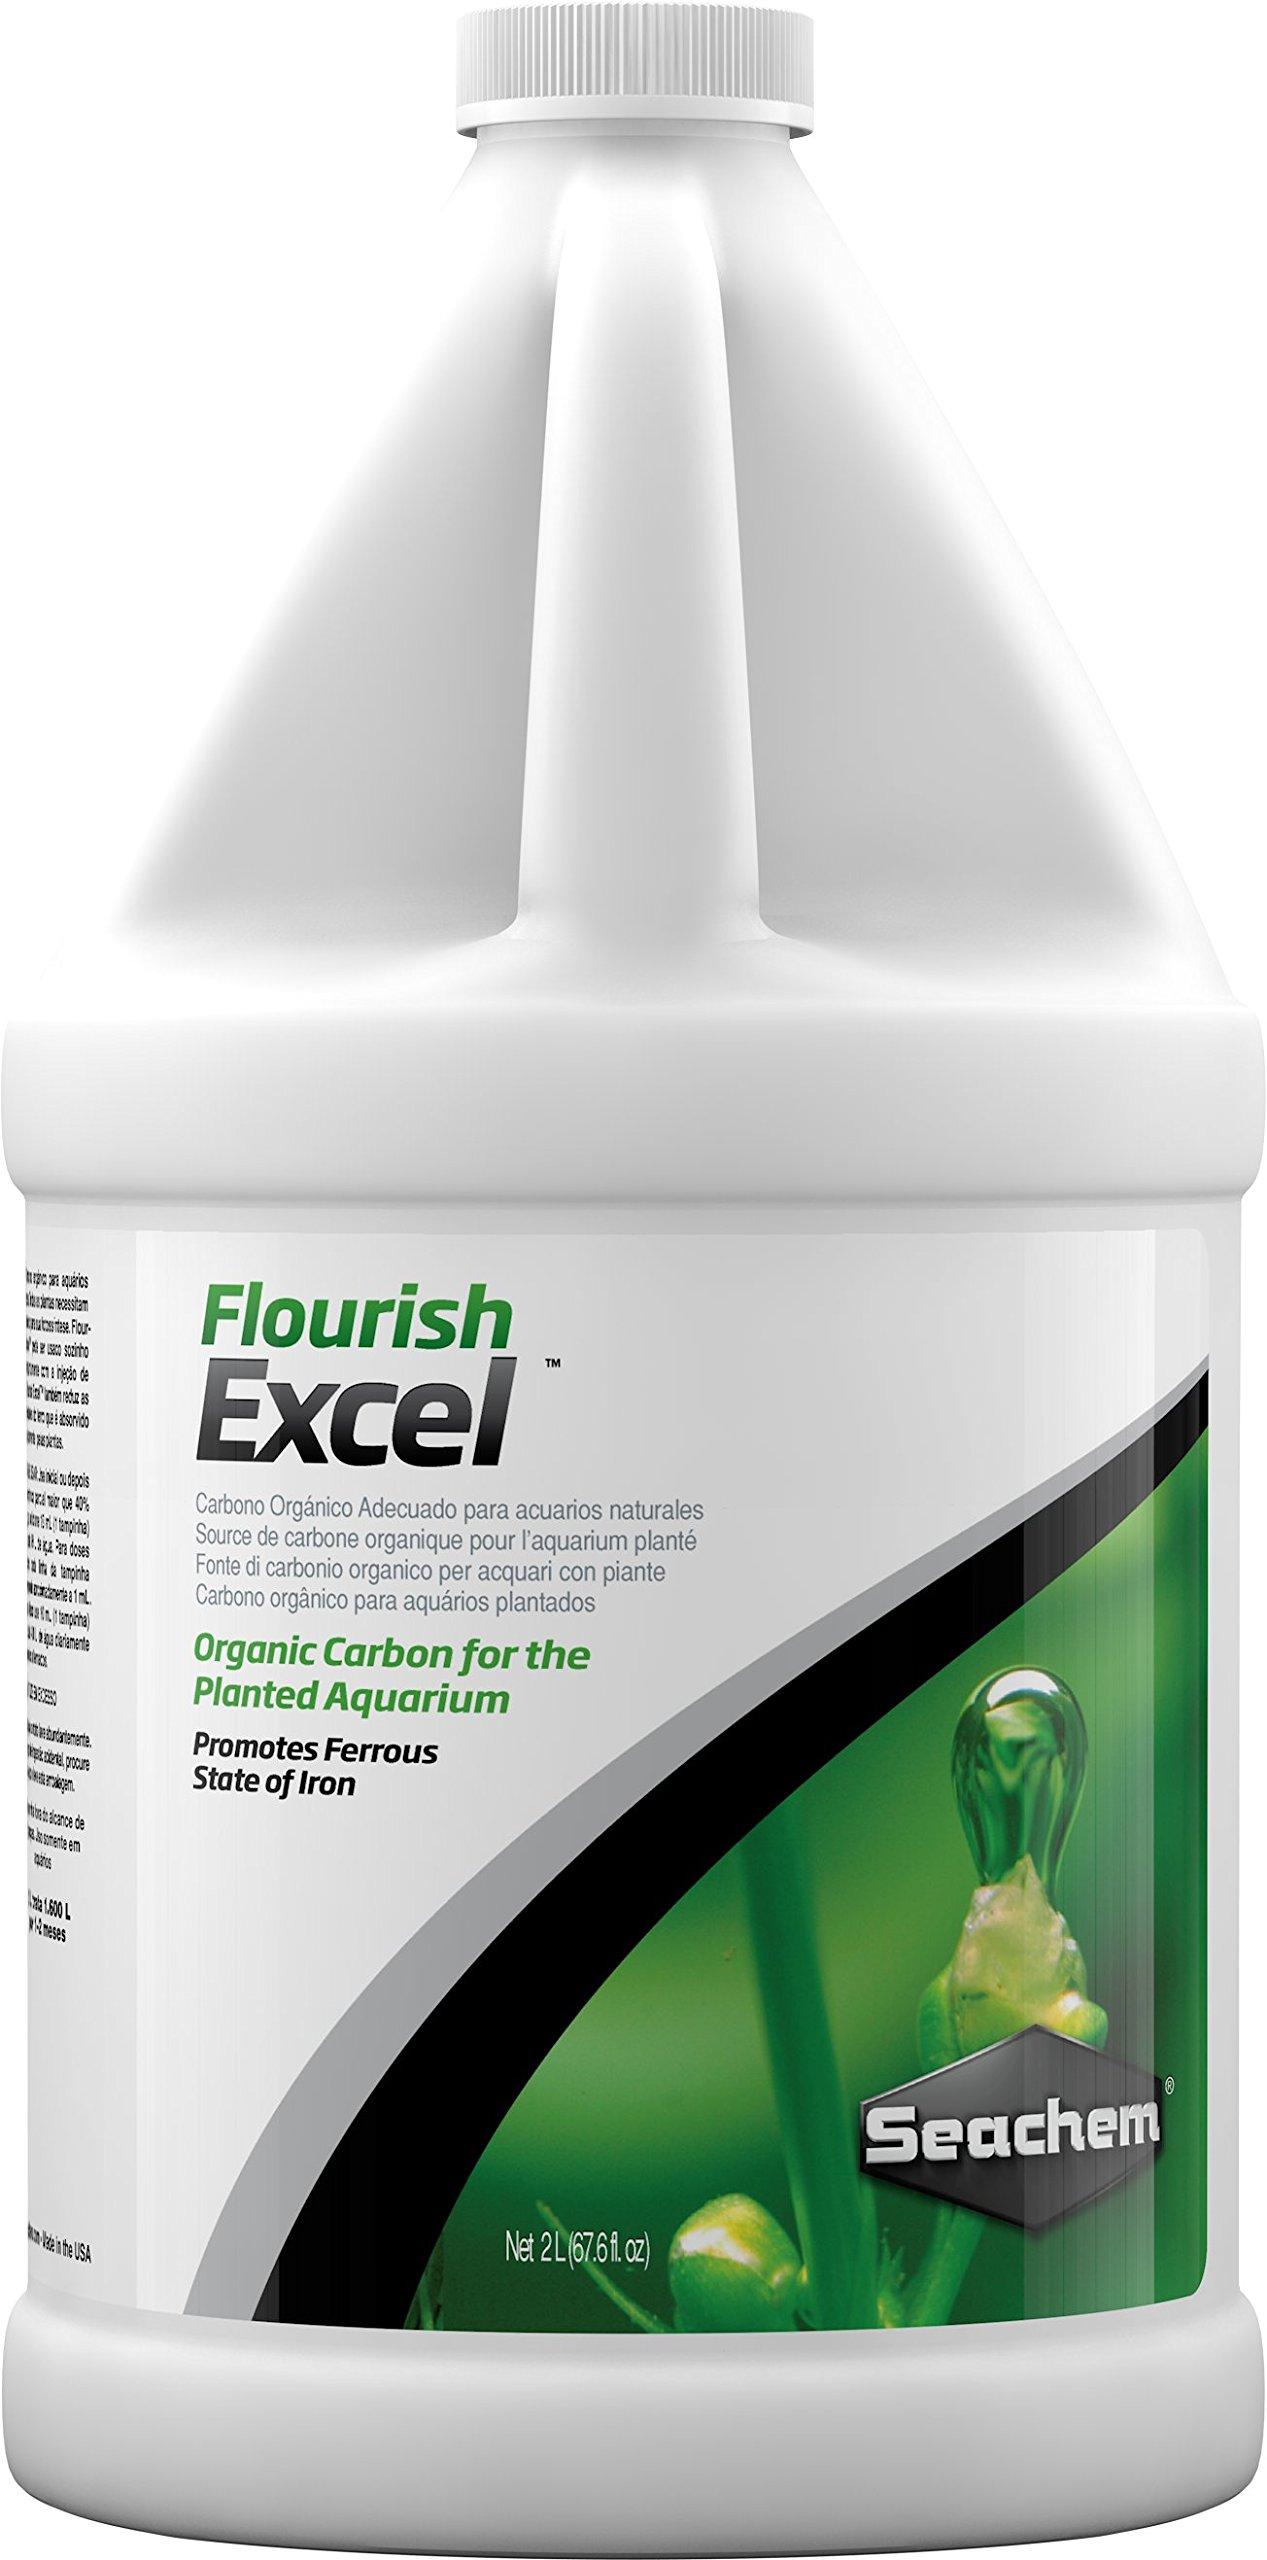 Flourish Excel, 2 L / 67.6 fl. oz. by Seachem